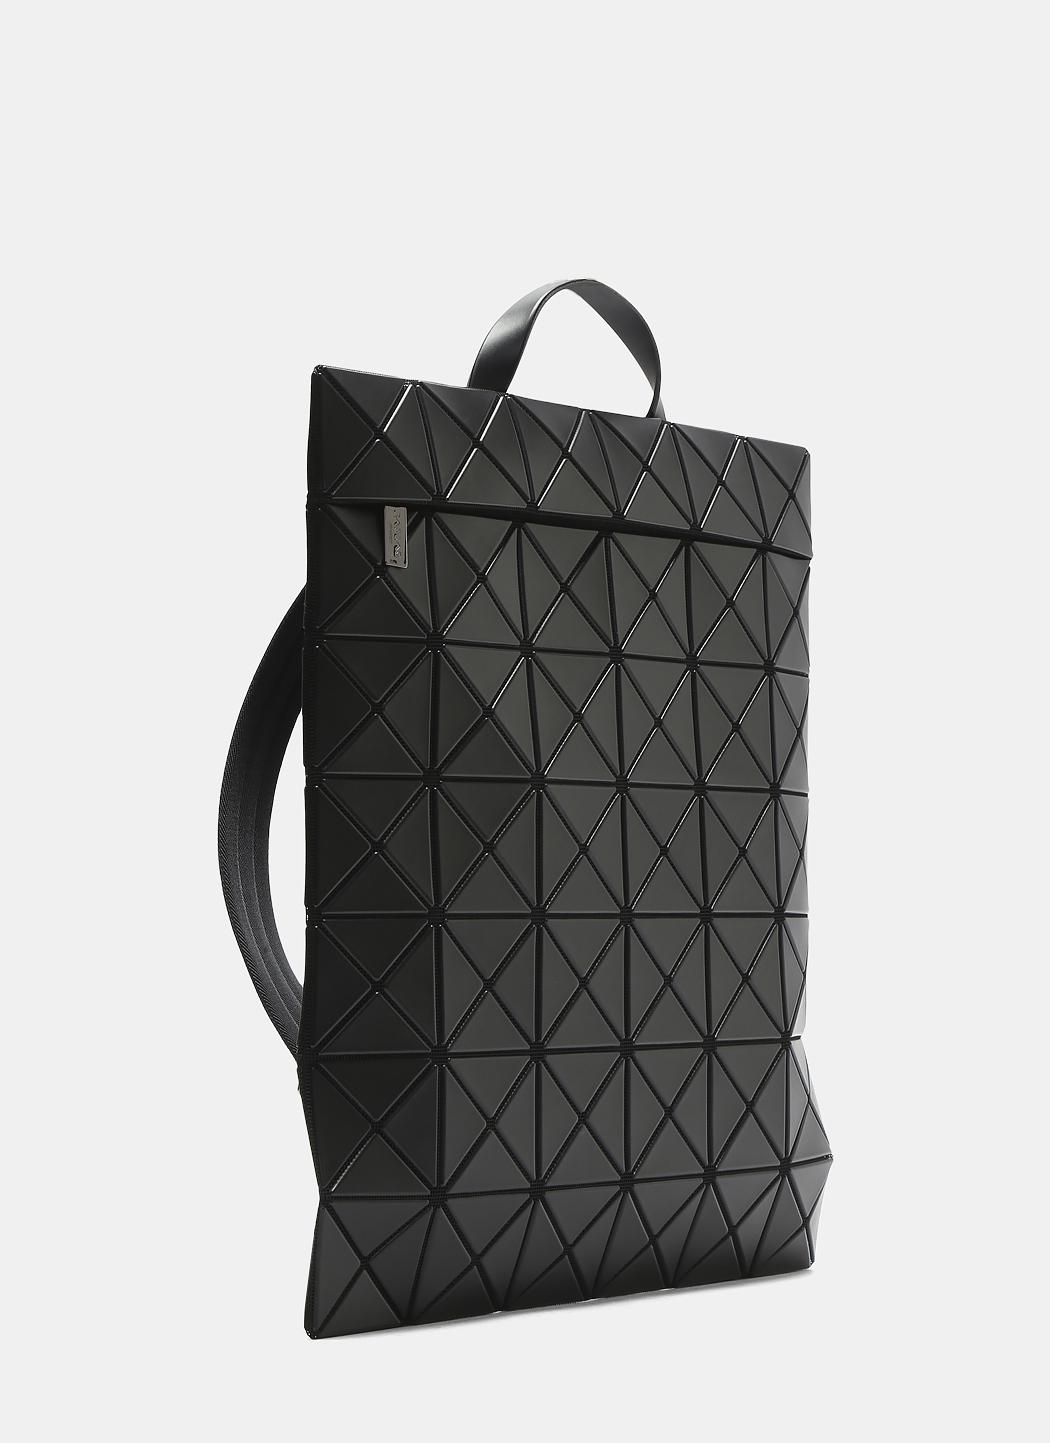 Lyst - Bao Bao Issey Miyake Flat Pack Matte Backpack In Black in Black 9fdc9e2d59163